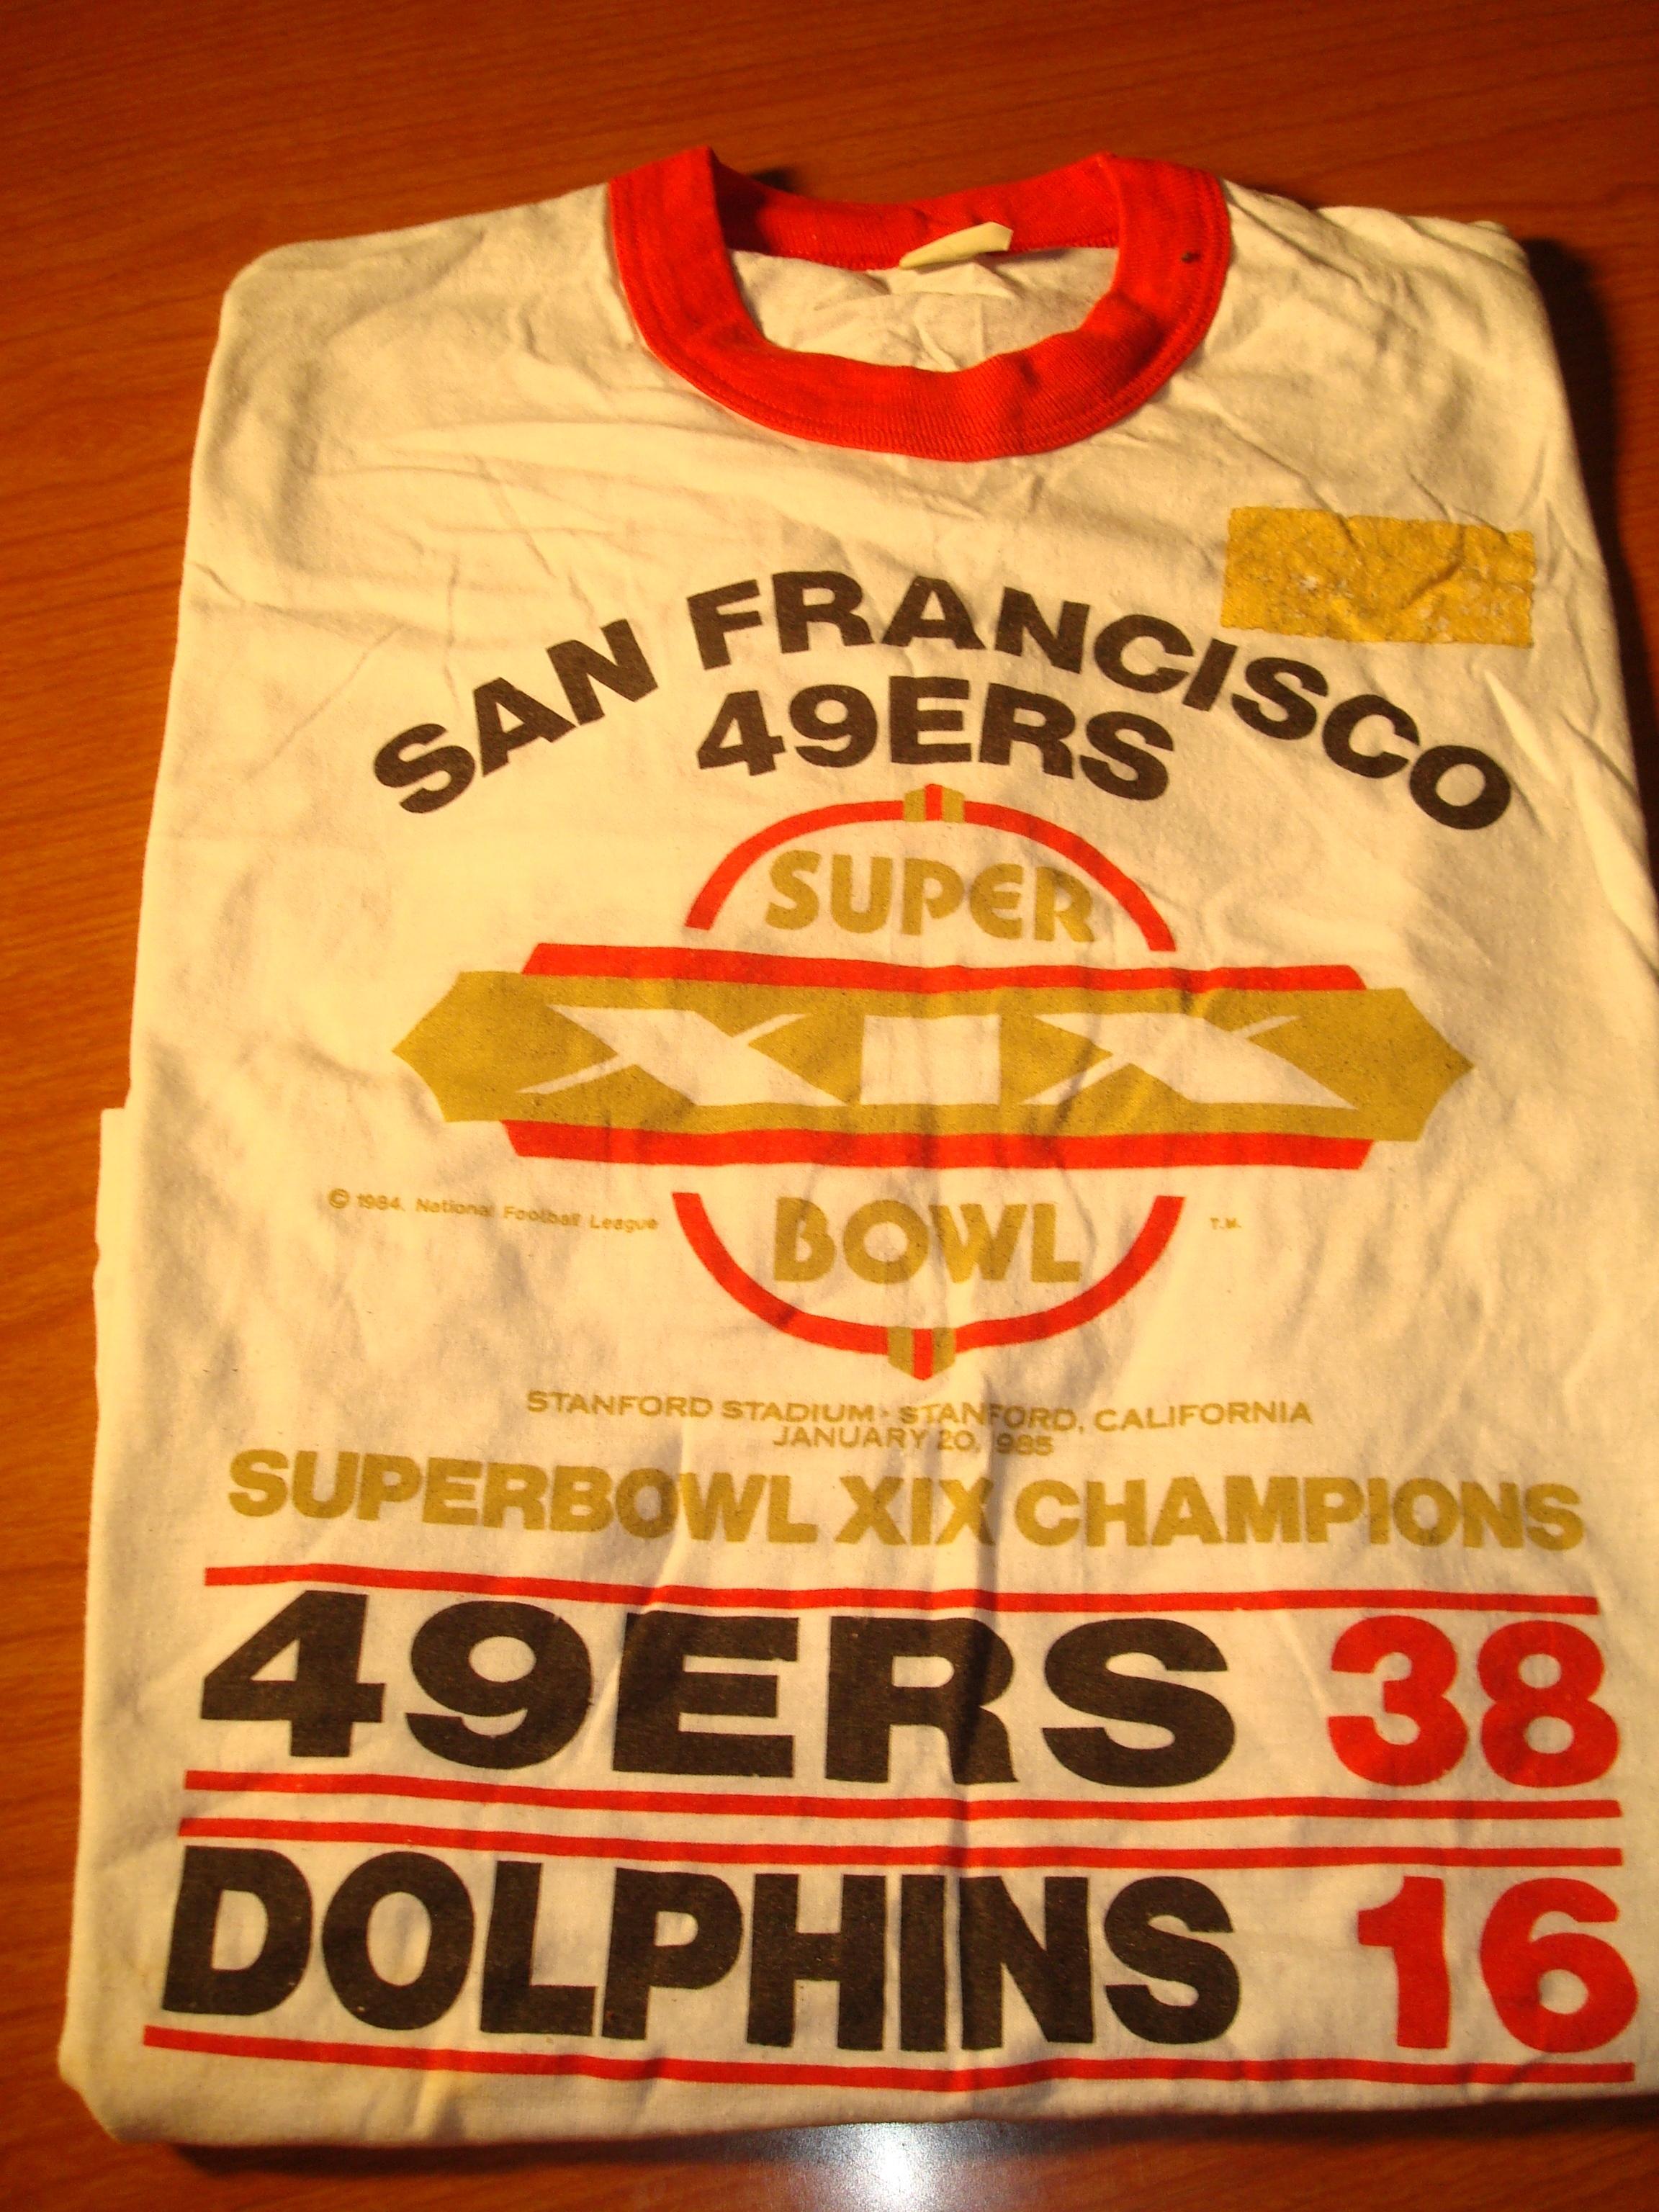 Super Bowl Xix Dolphins Vs 49Ers | Imasportsphile inside San Francisco 49Ers Nfl Championships 1985